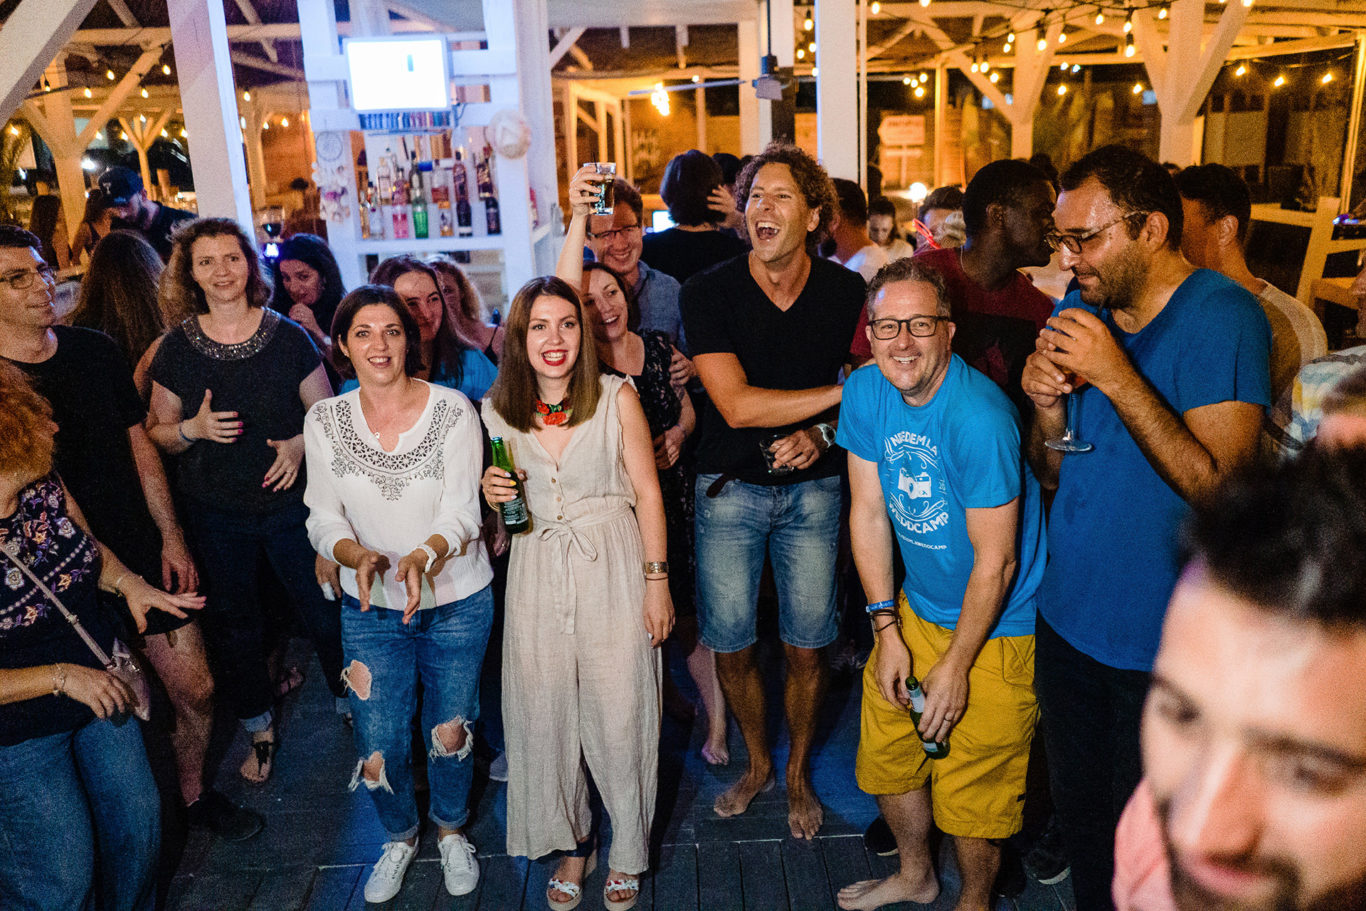 Happy people @ Weddcamp